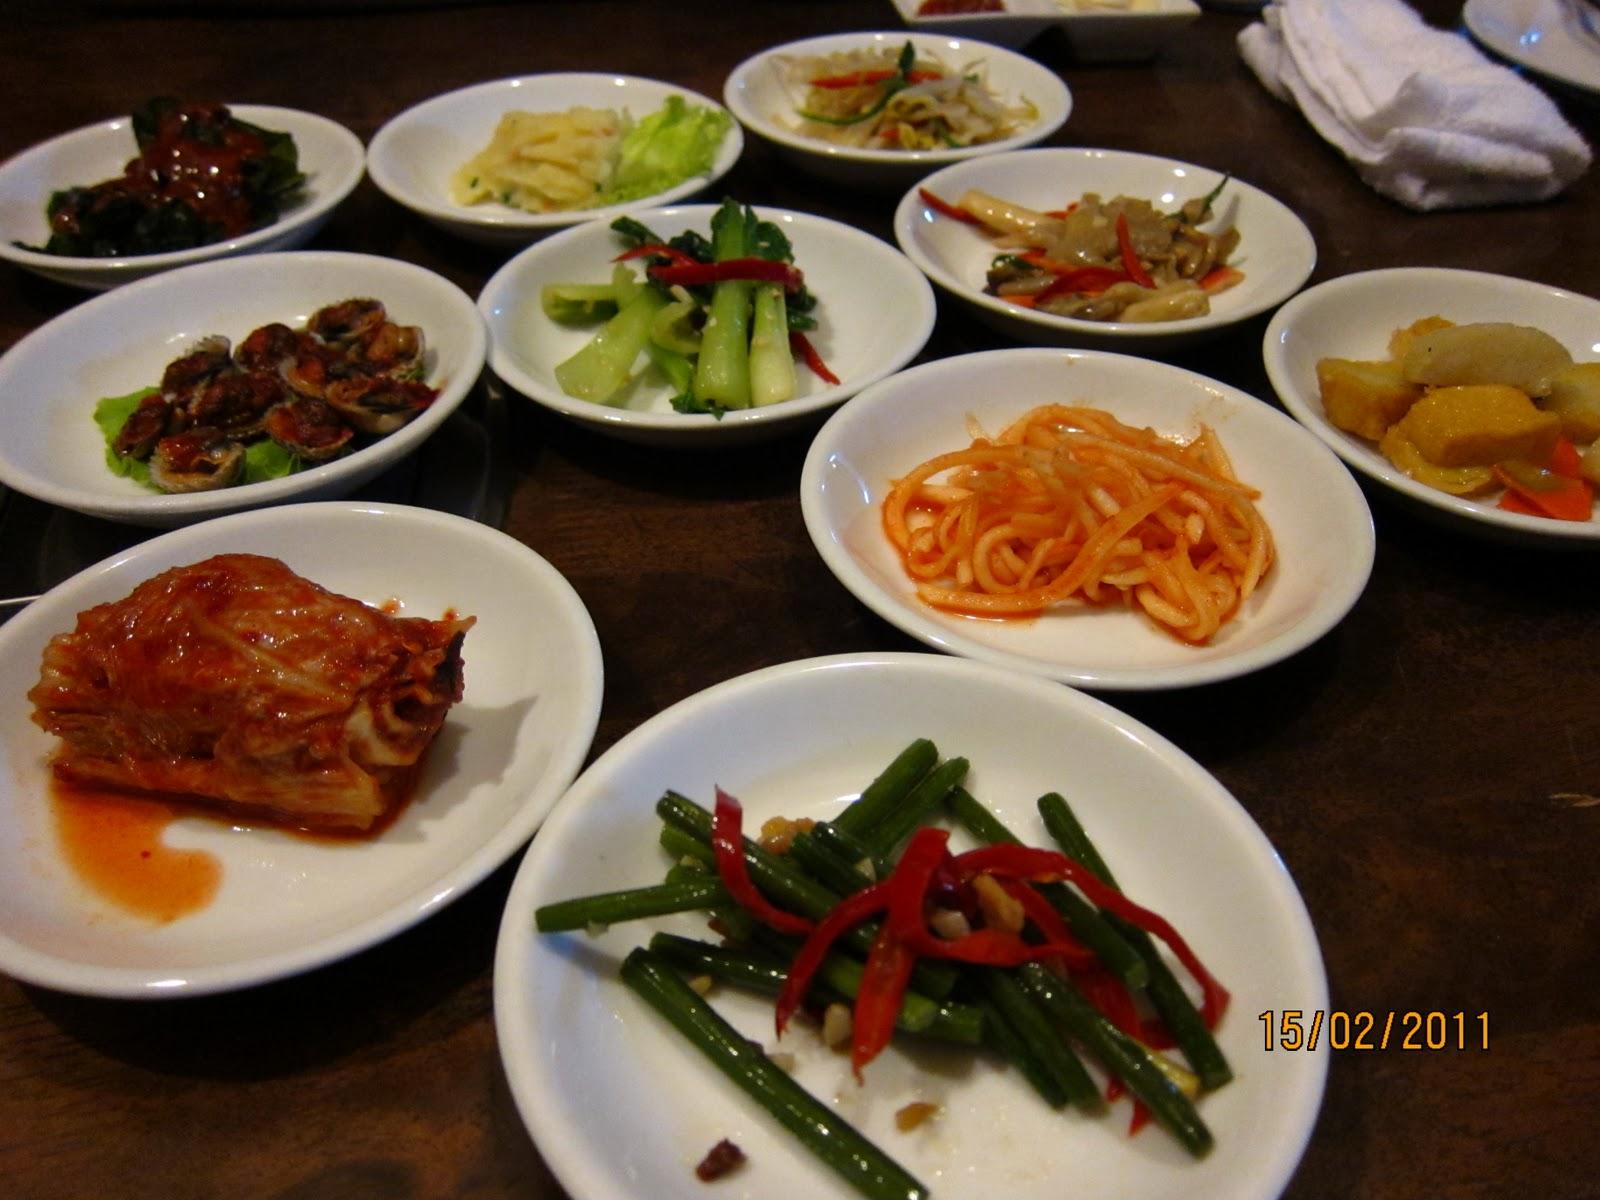 Korean Garden Bbq Restaurant Jb Foodie Drink Dine With Perspectives